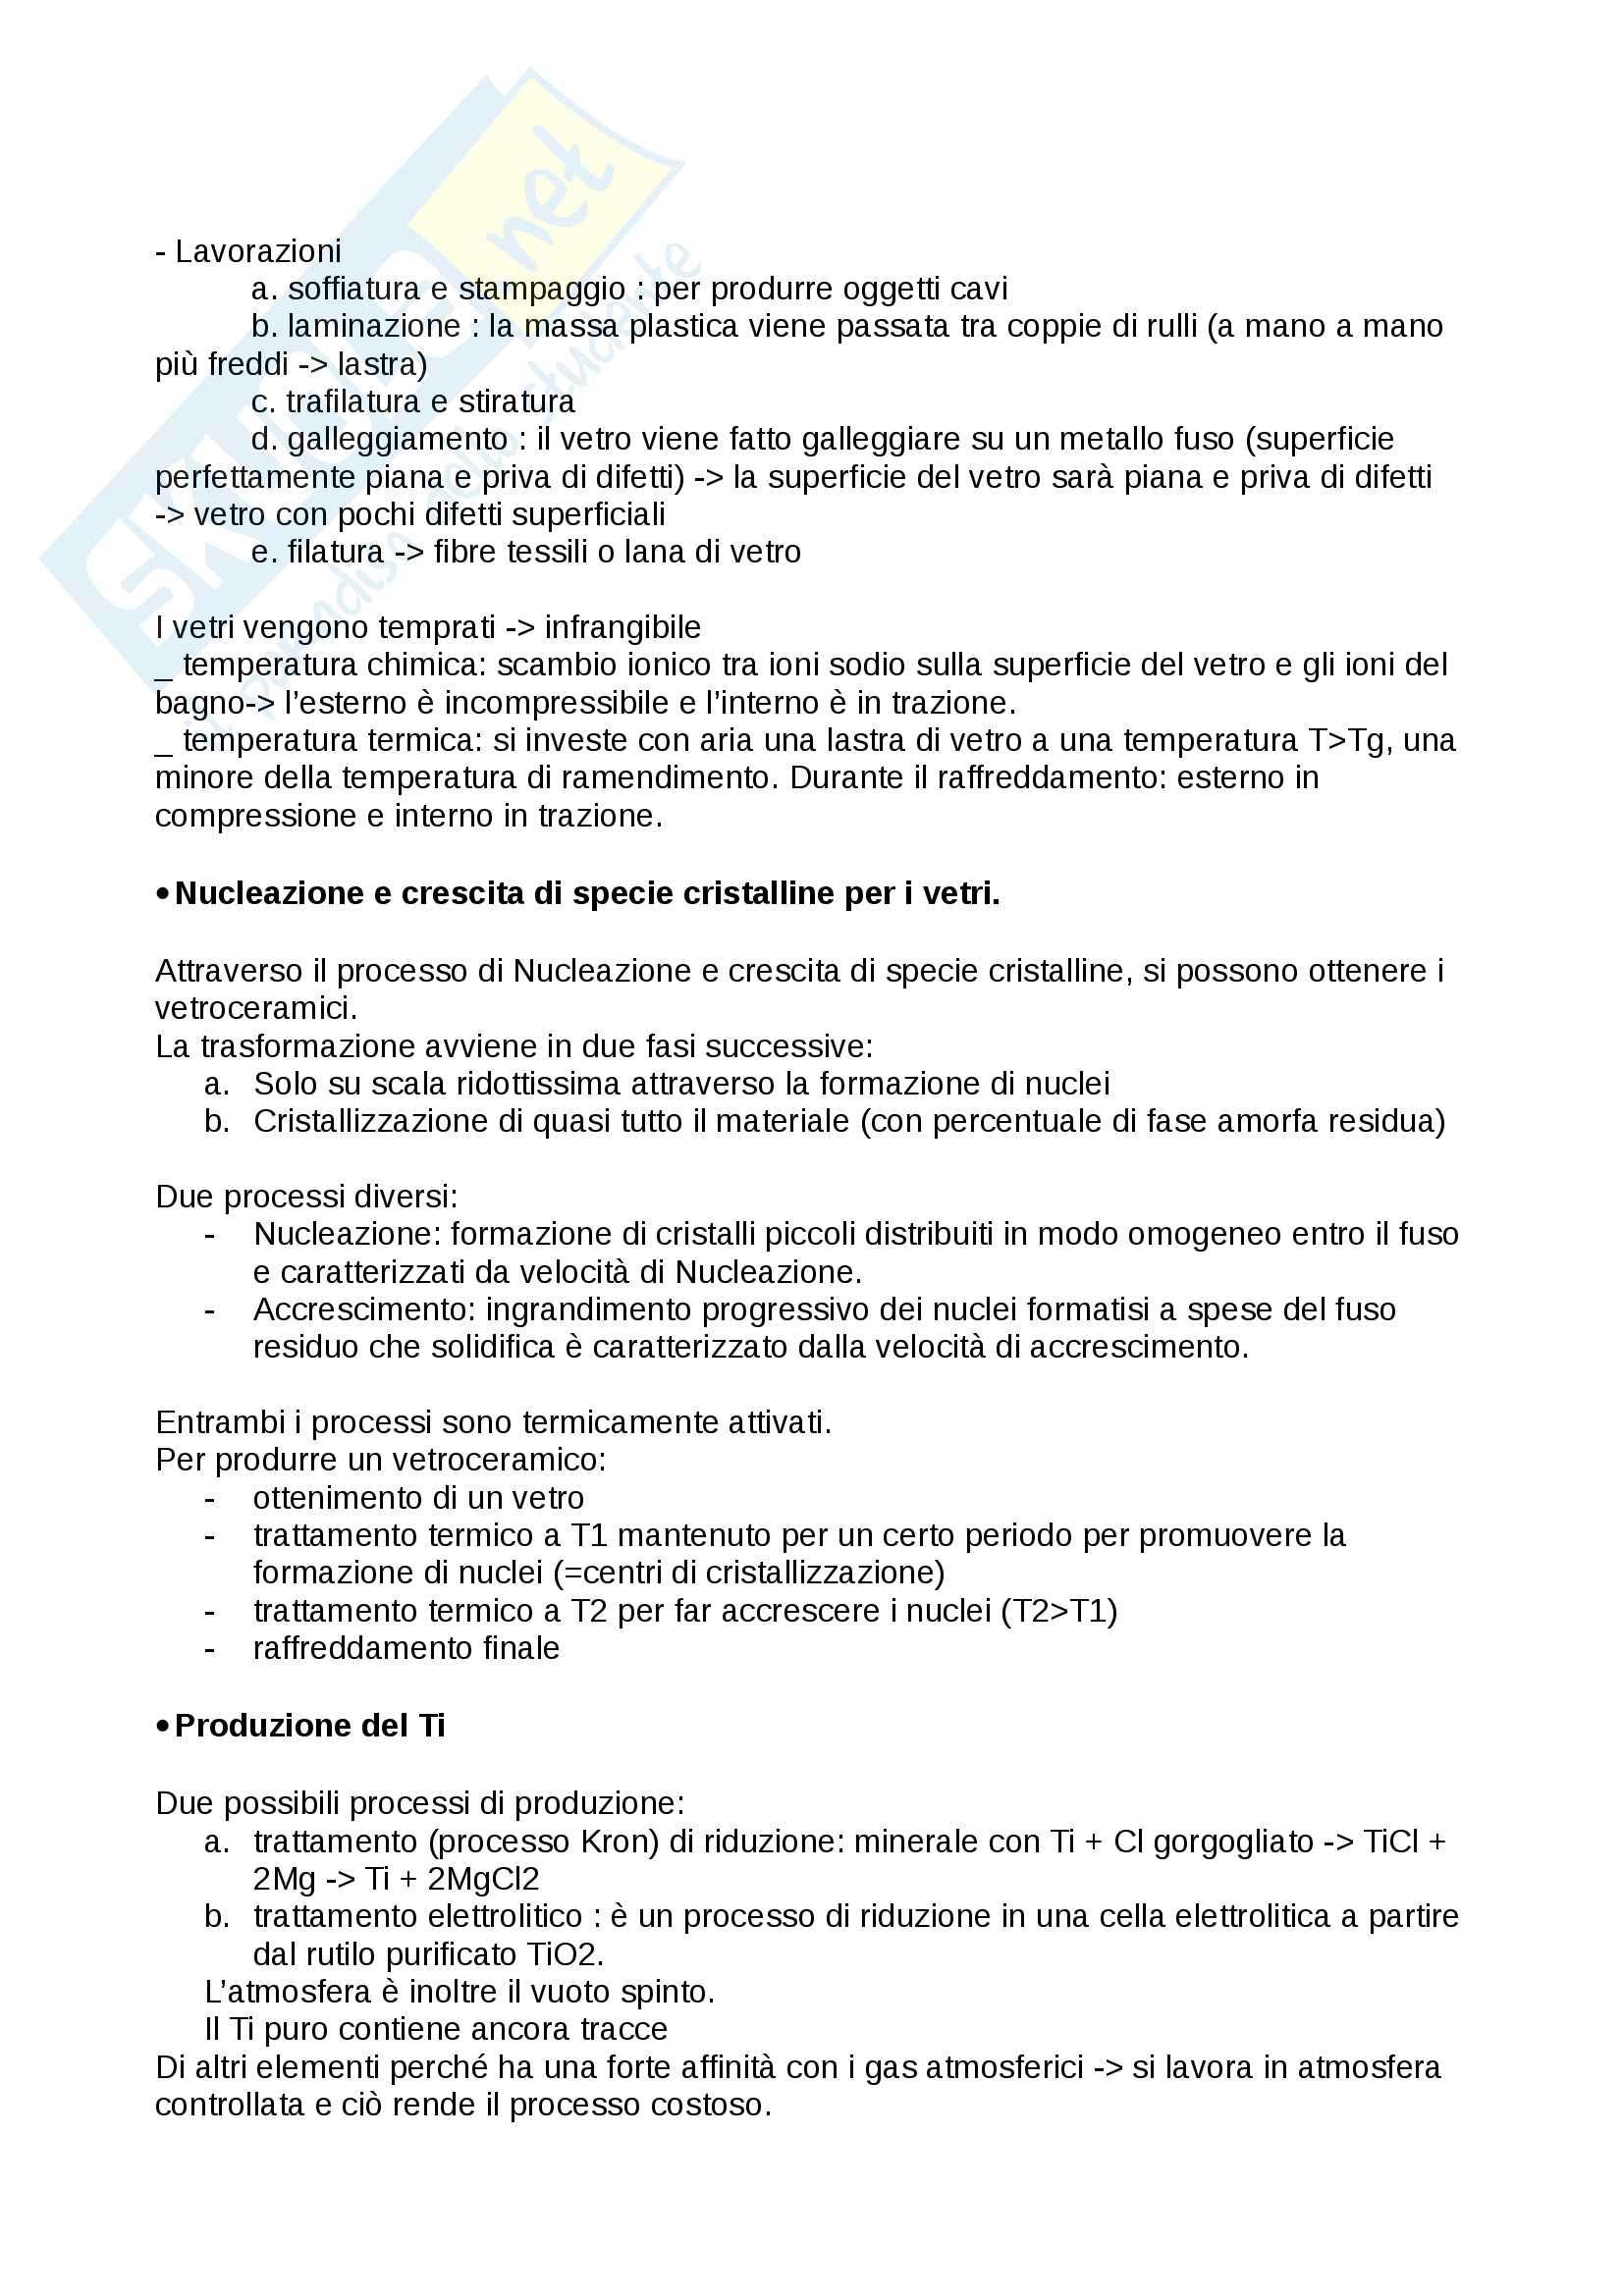 Scienze dei materiali: domande esame - Verné Pag. 11